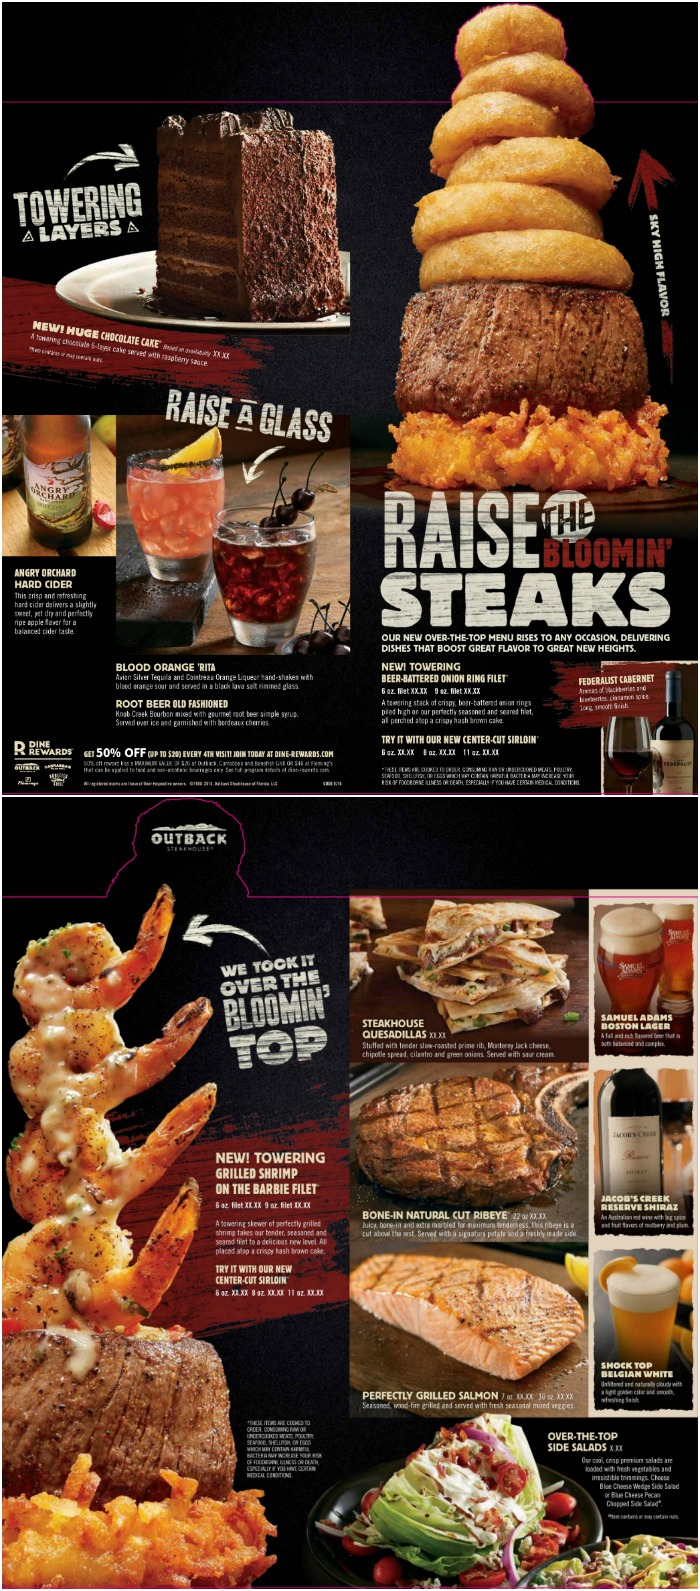 raise-the-bloomin-steaks-outback-steakhouse-raise-the-steaks-menu